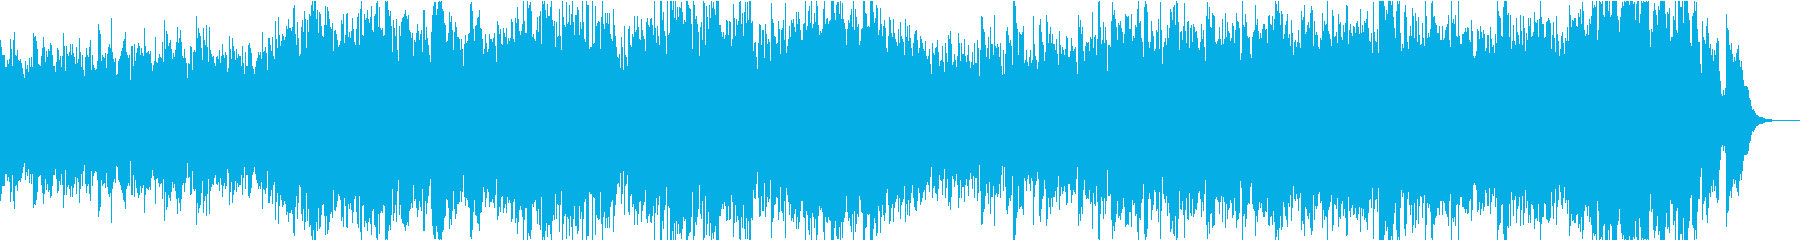 Dramatic and sad ensemble's reproduced waveform